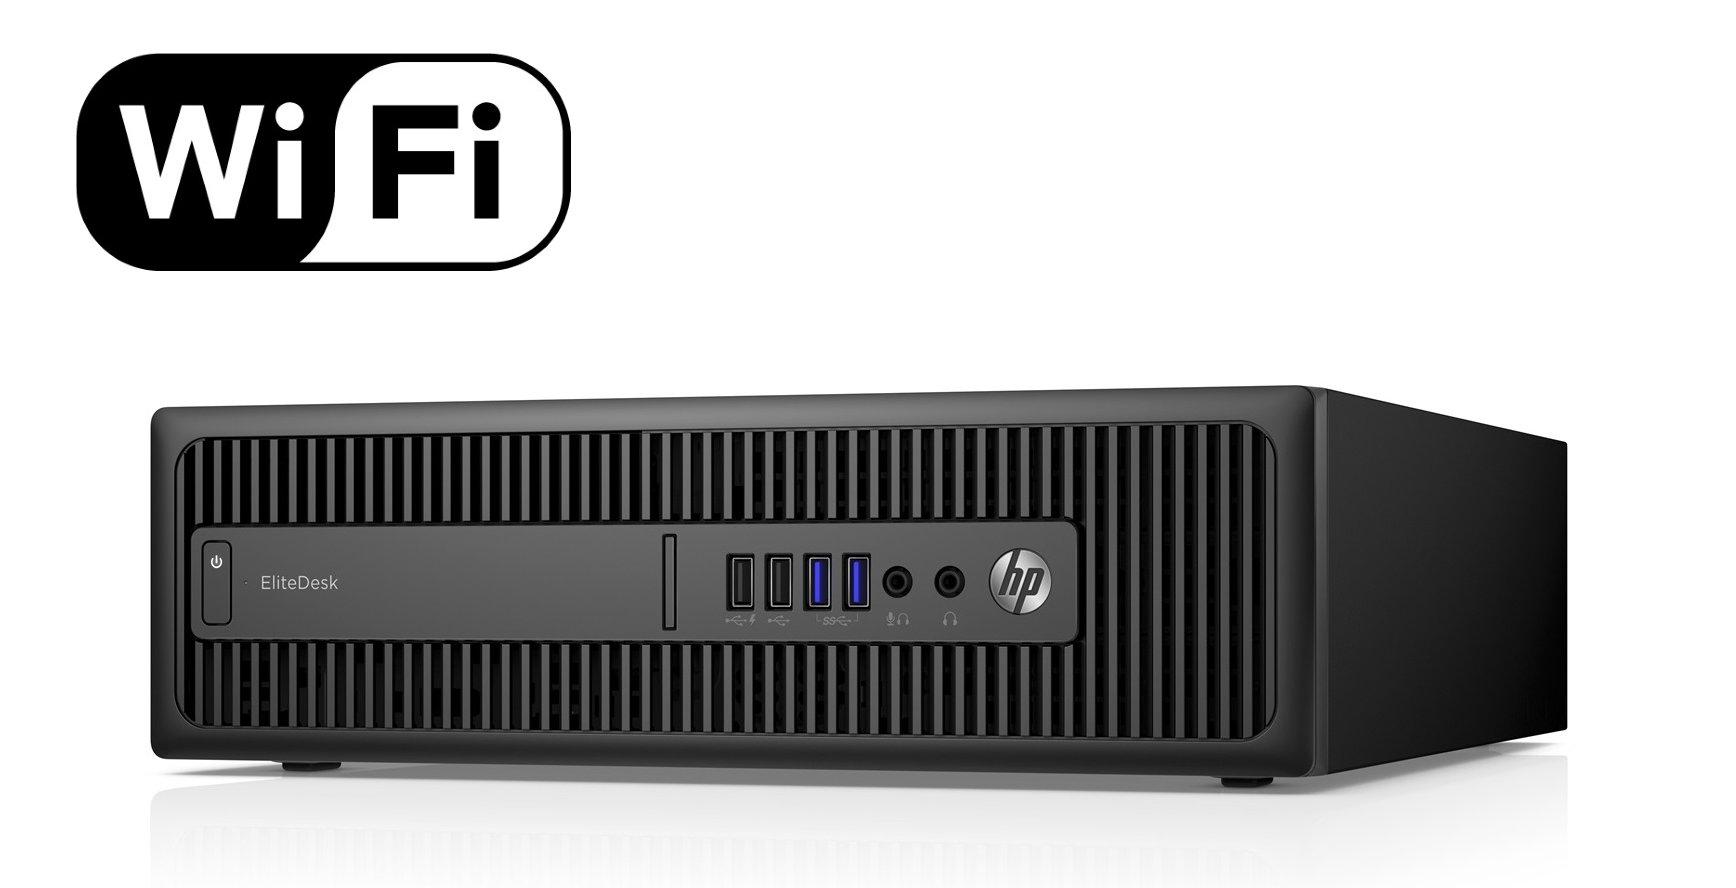 HP EliteDesk 800 G1 SFF Computer Intel i5 3.20Ghz 16GB RAM 240GB SSD Win 10 Pro (Renewed)